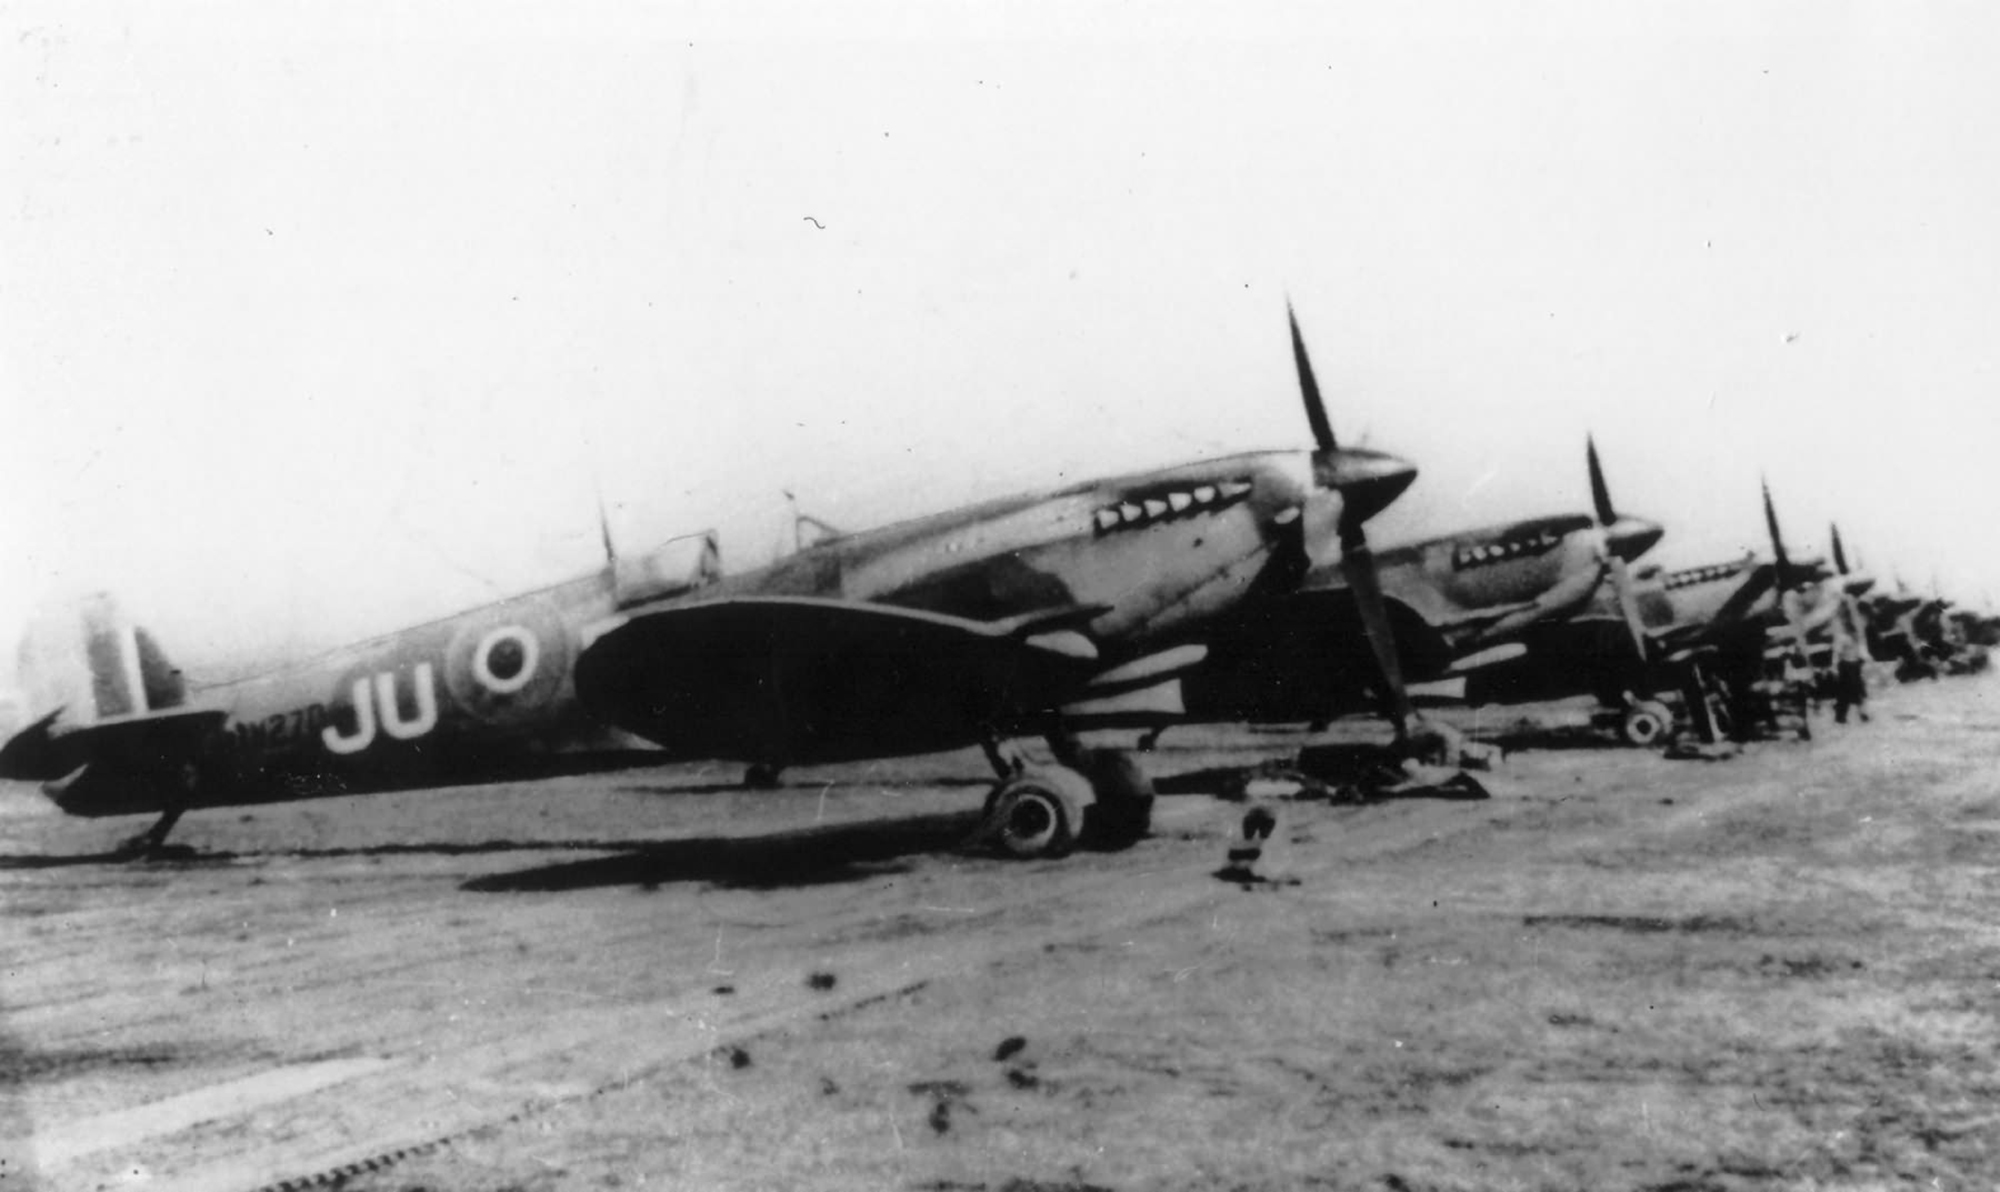 Spitfire MkIXe RAF 11Sqn JUF PV270 web 01